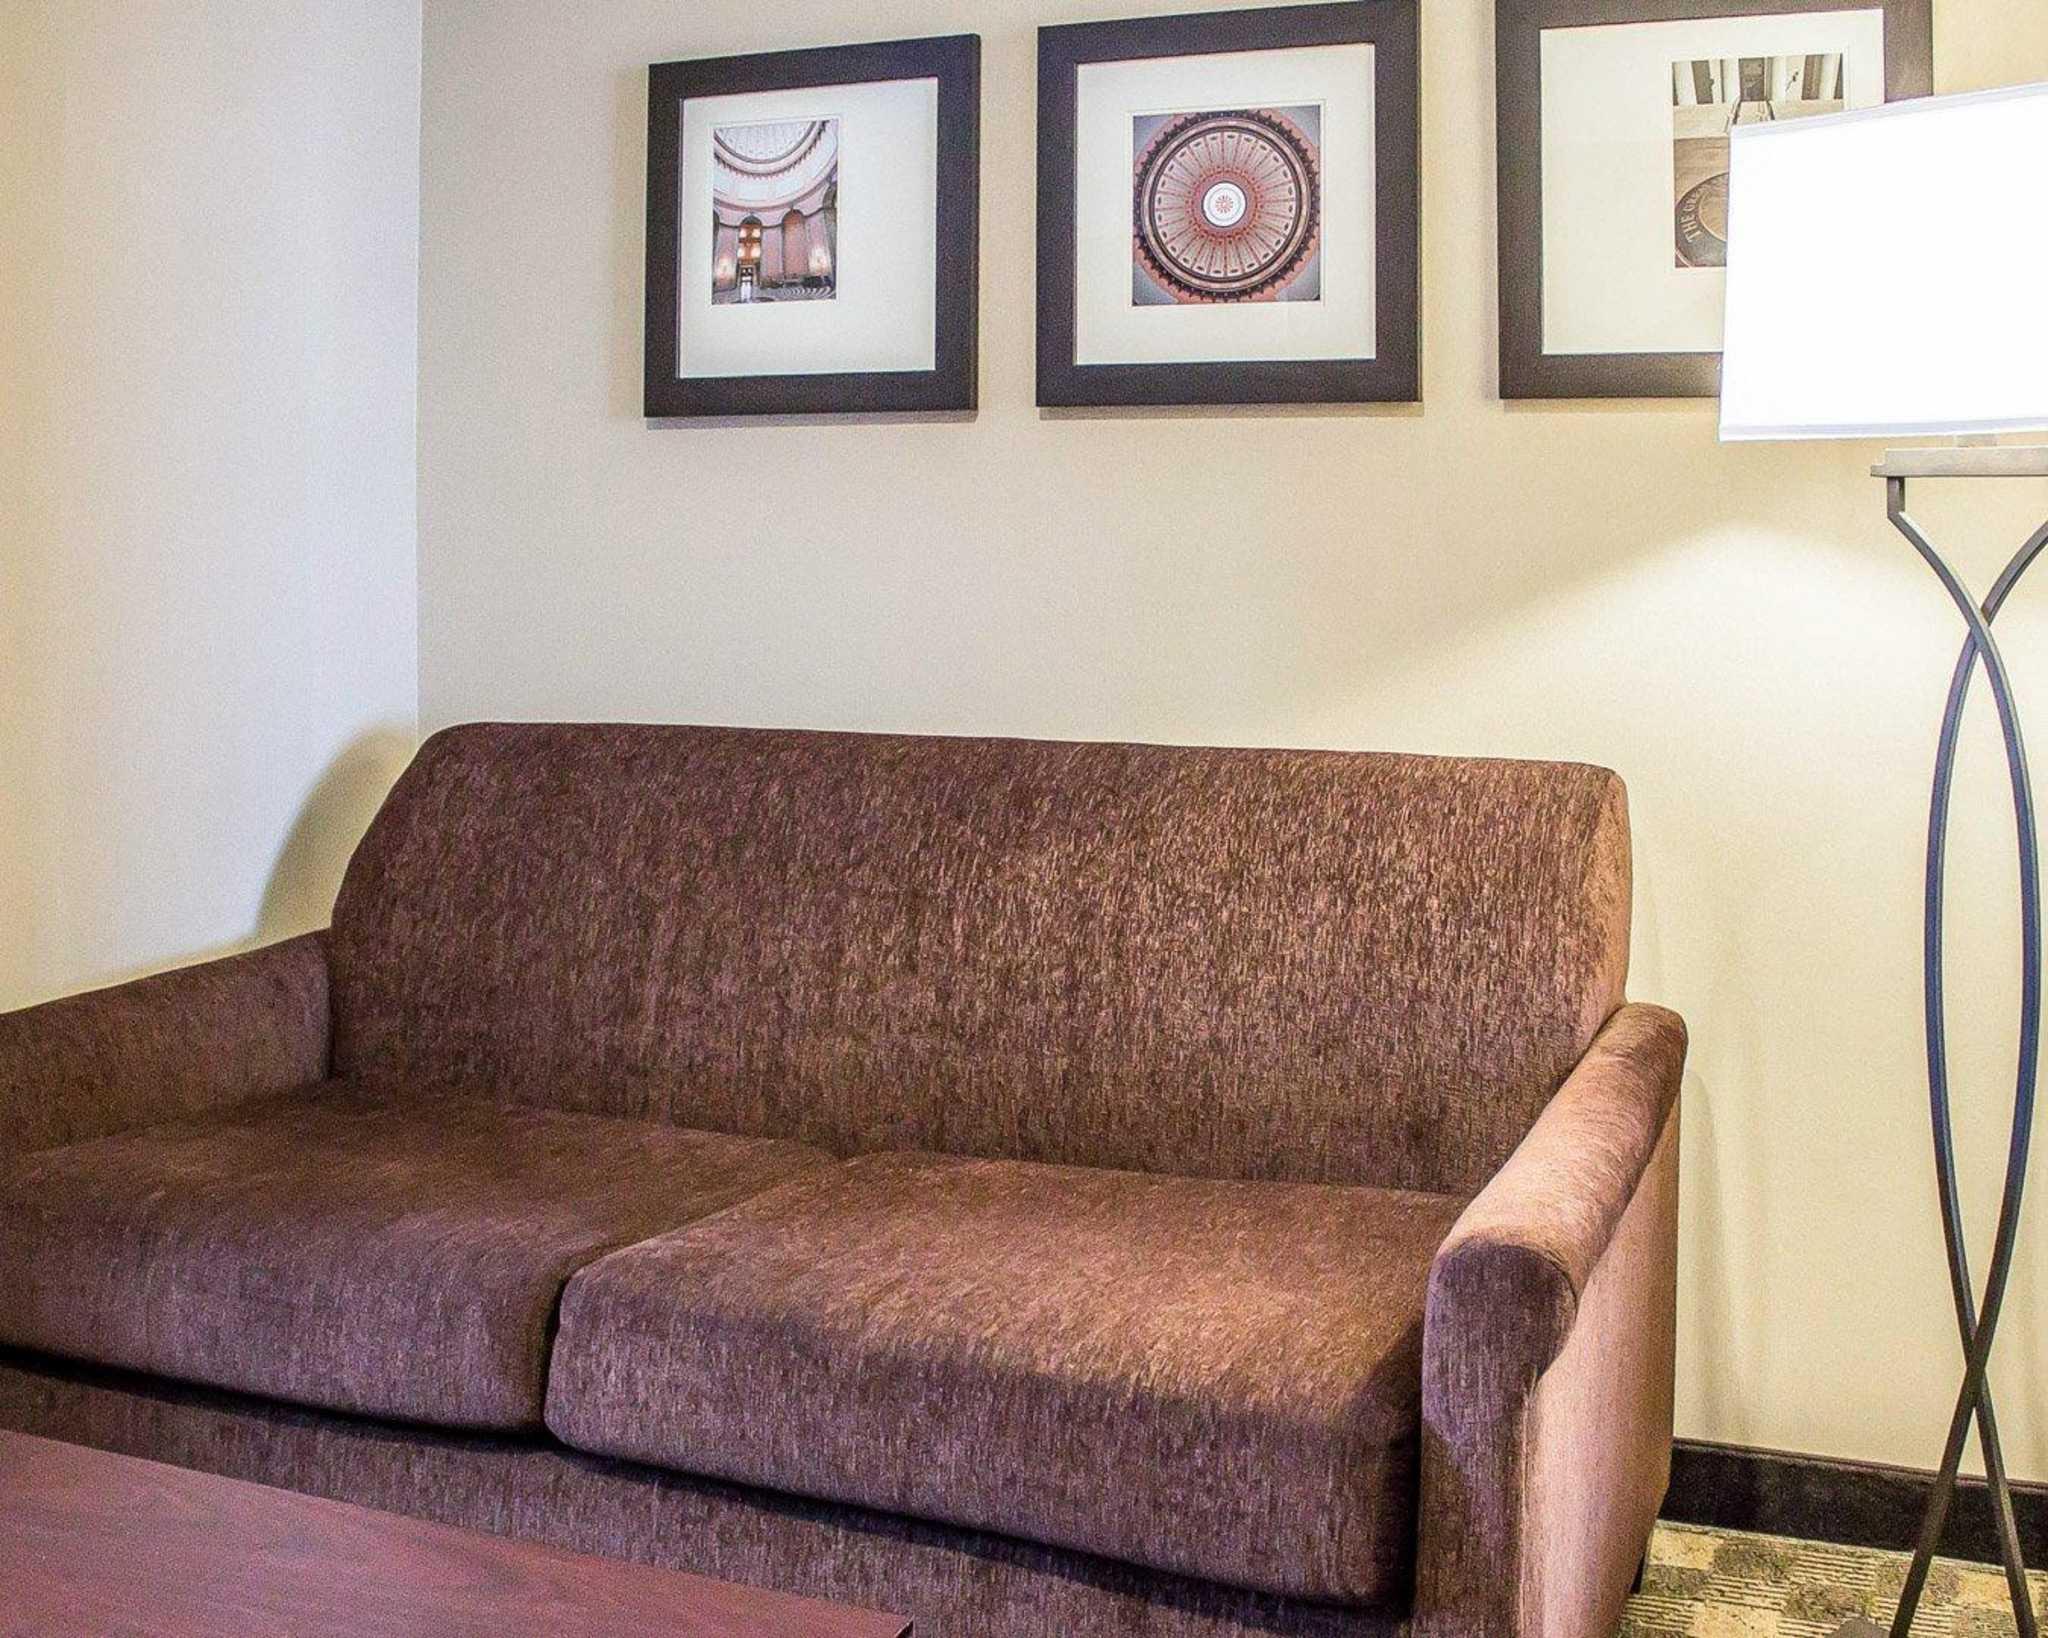 Comfort Suites Perrysburg - Toledo South image 24